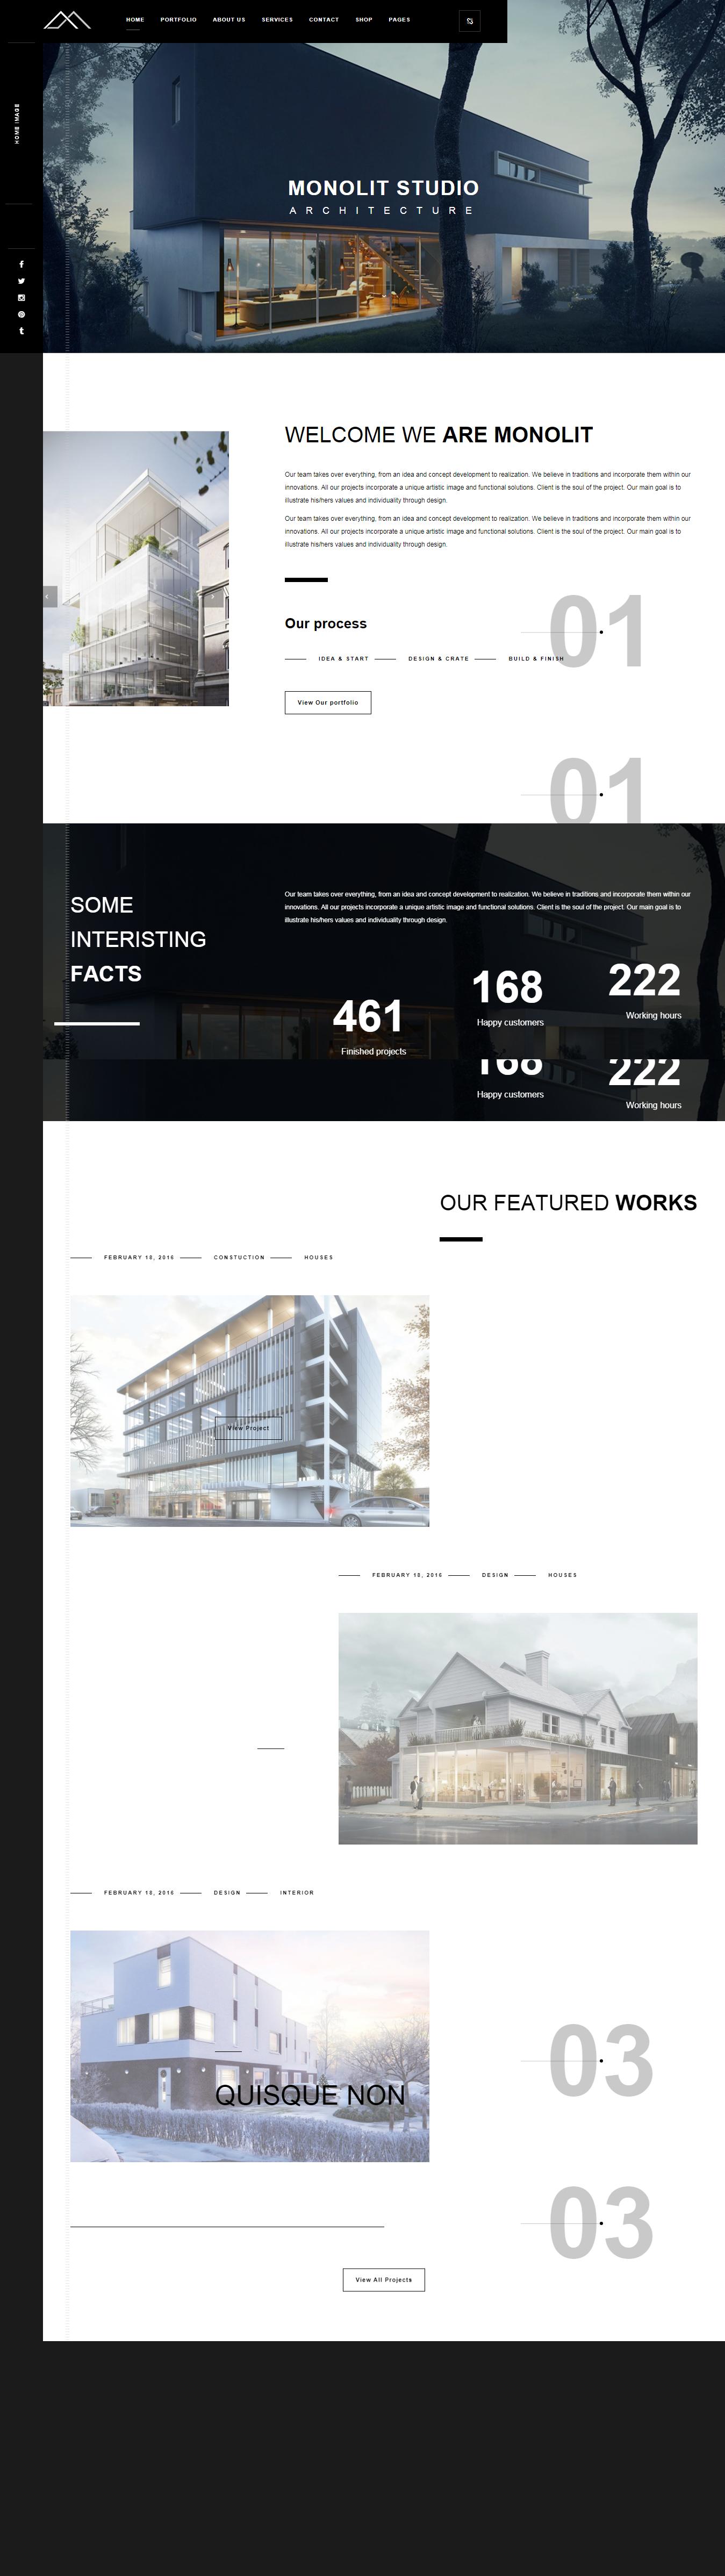 Monolit- Best Premium Architecture WordPress Theme